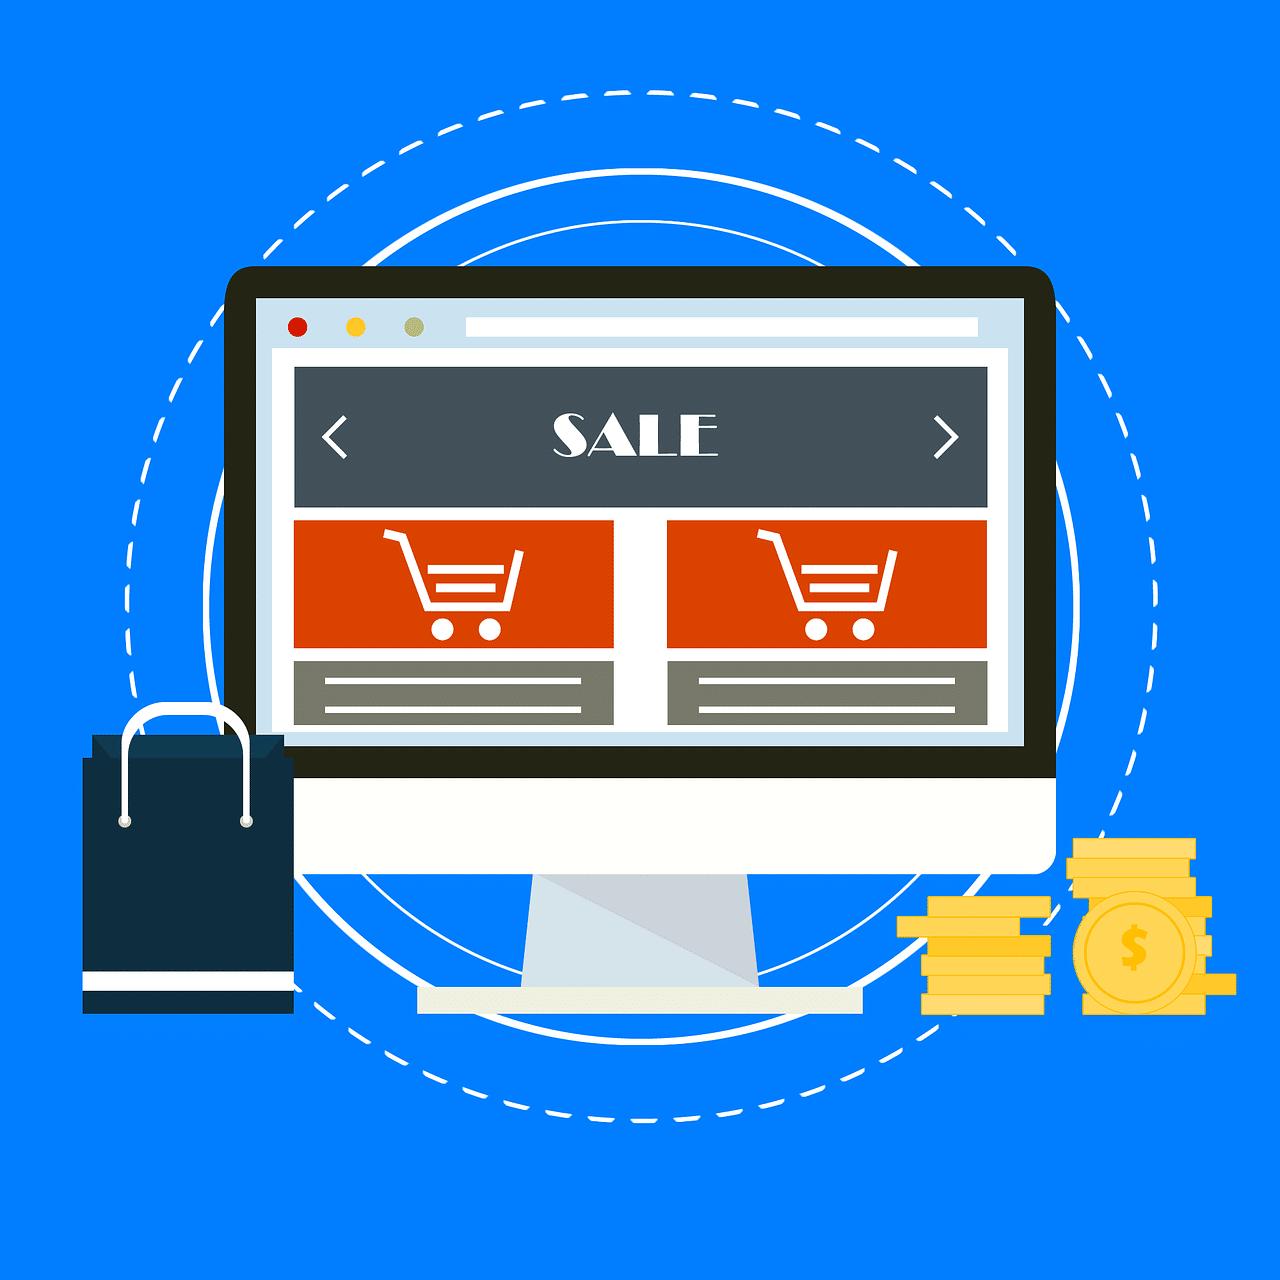 Prepara tu tienda online para las rebajas